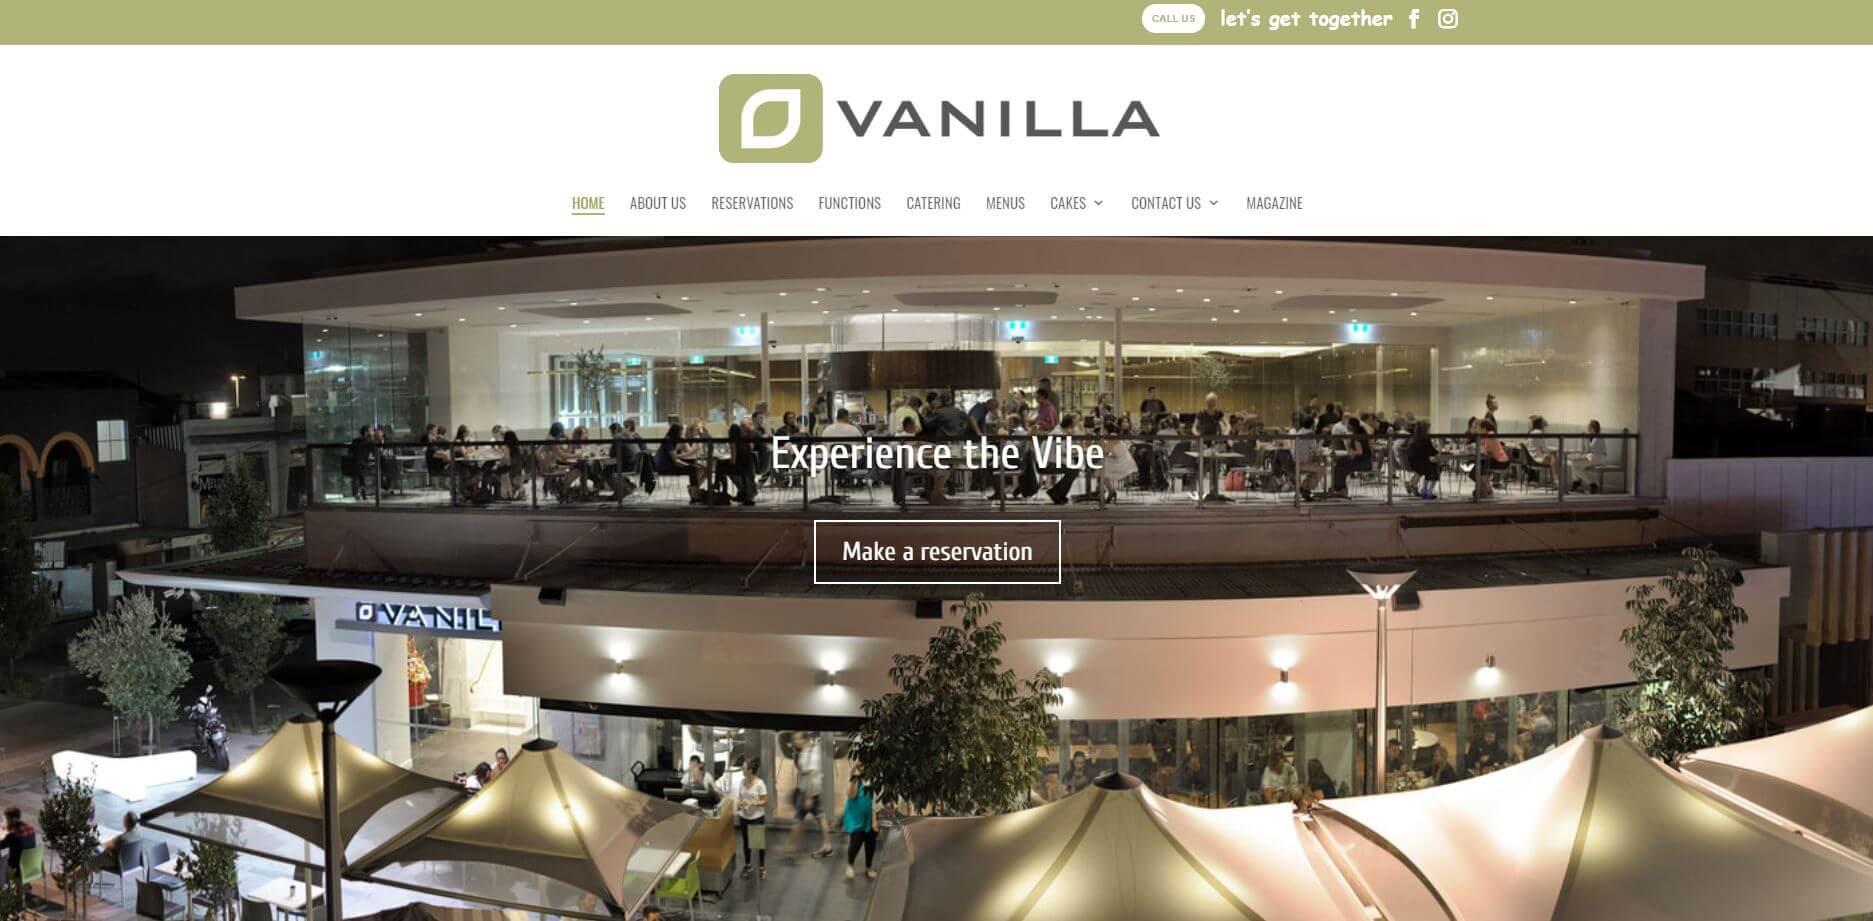 Vanilla Cakes & Lounge